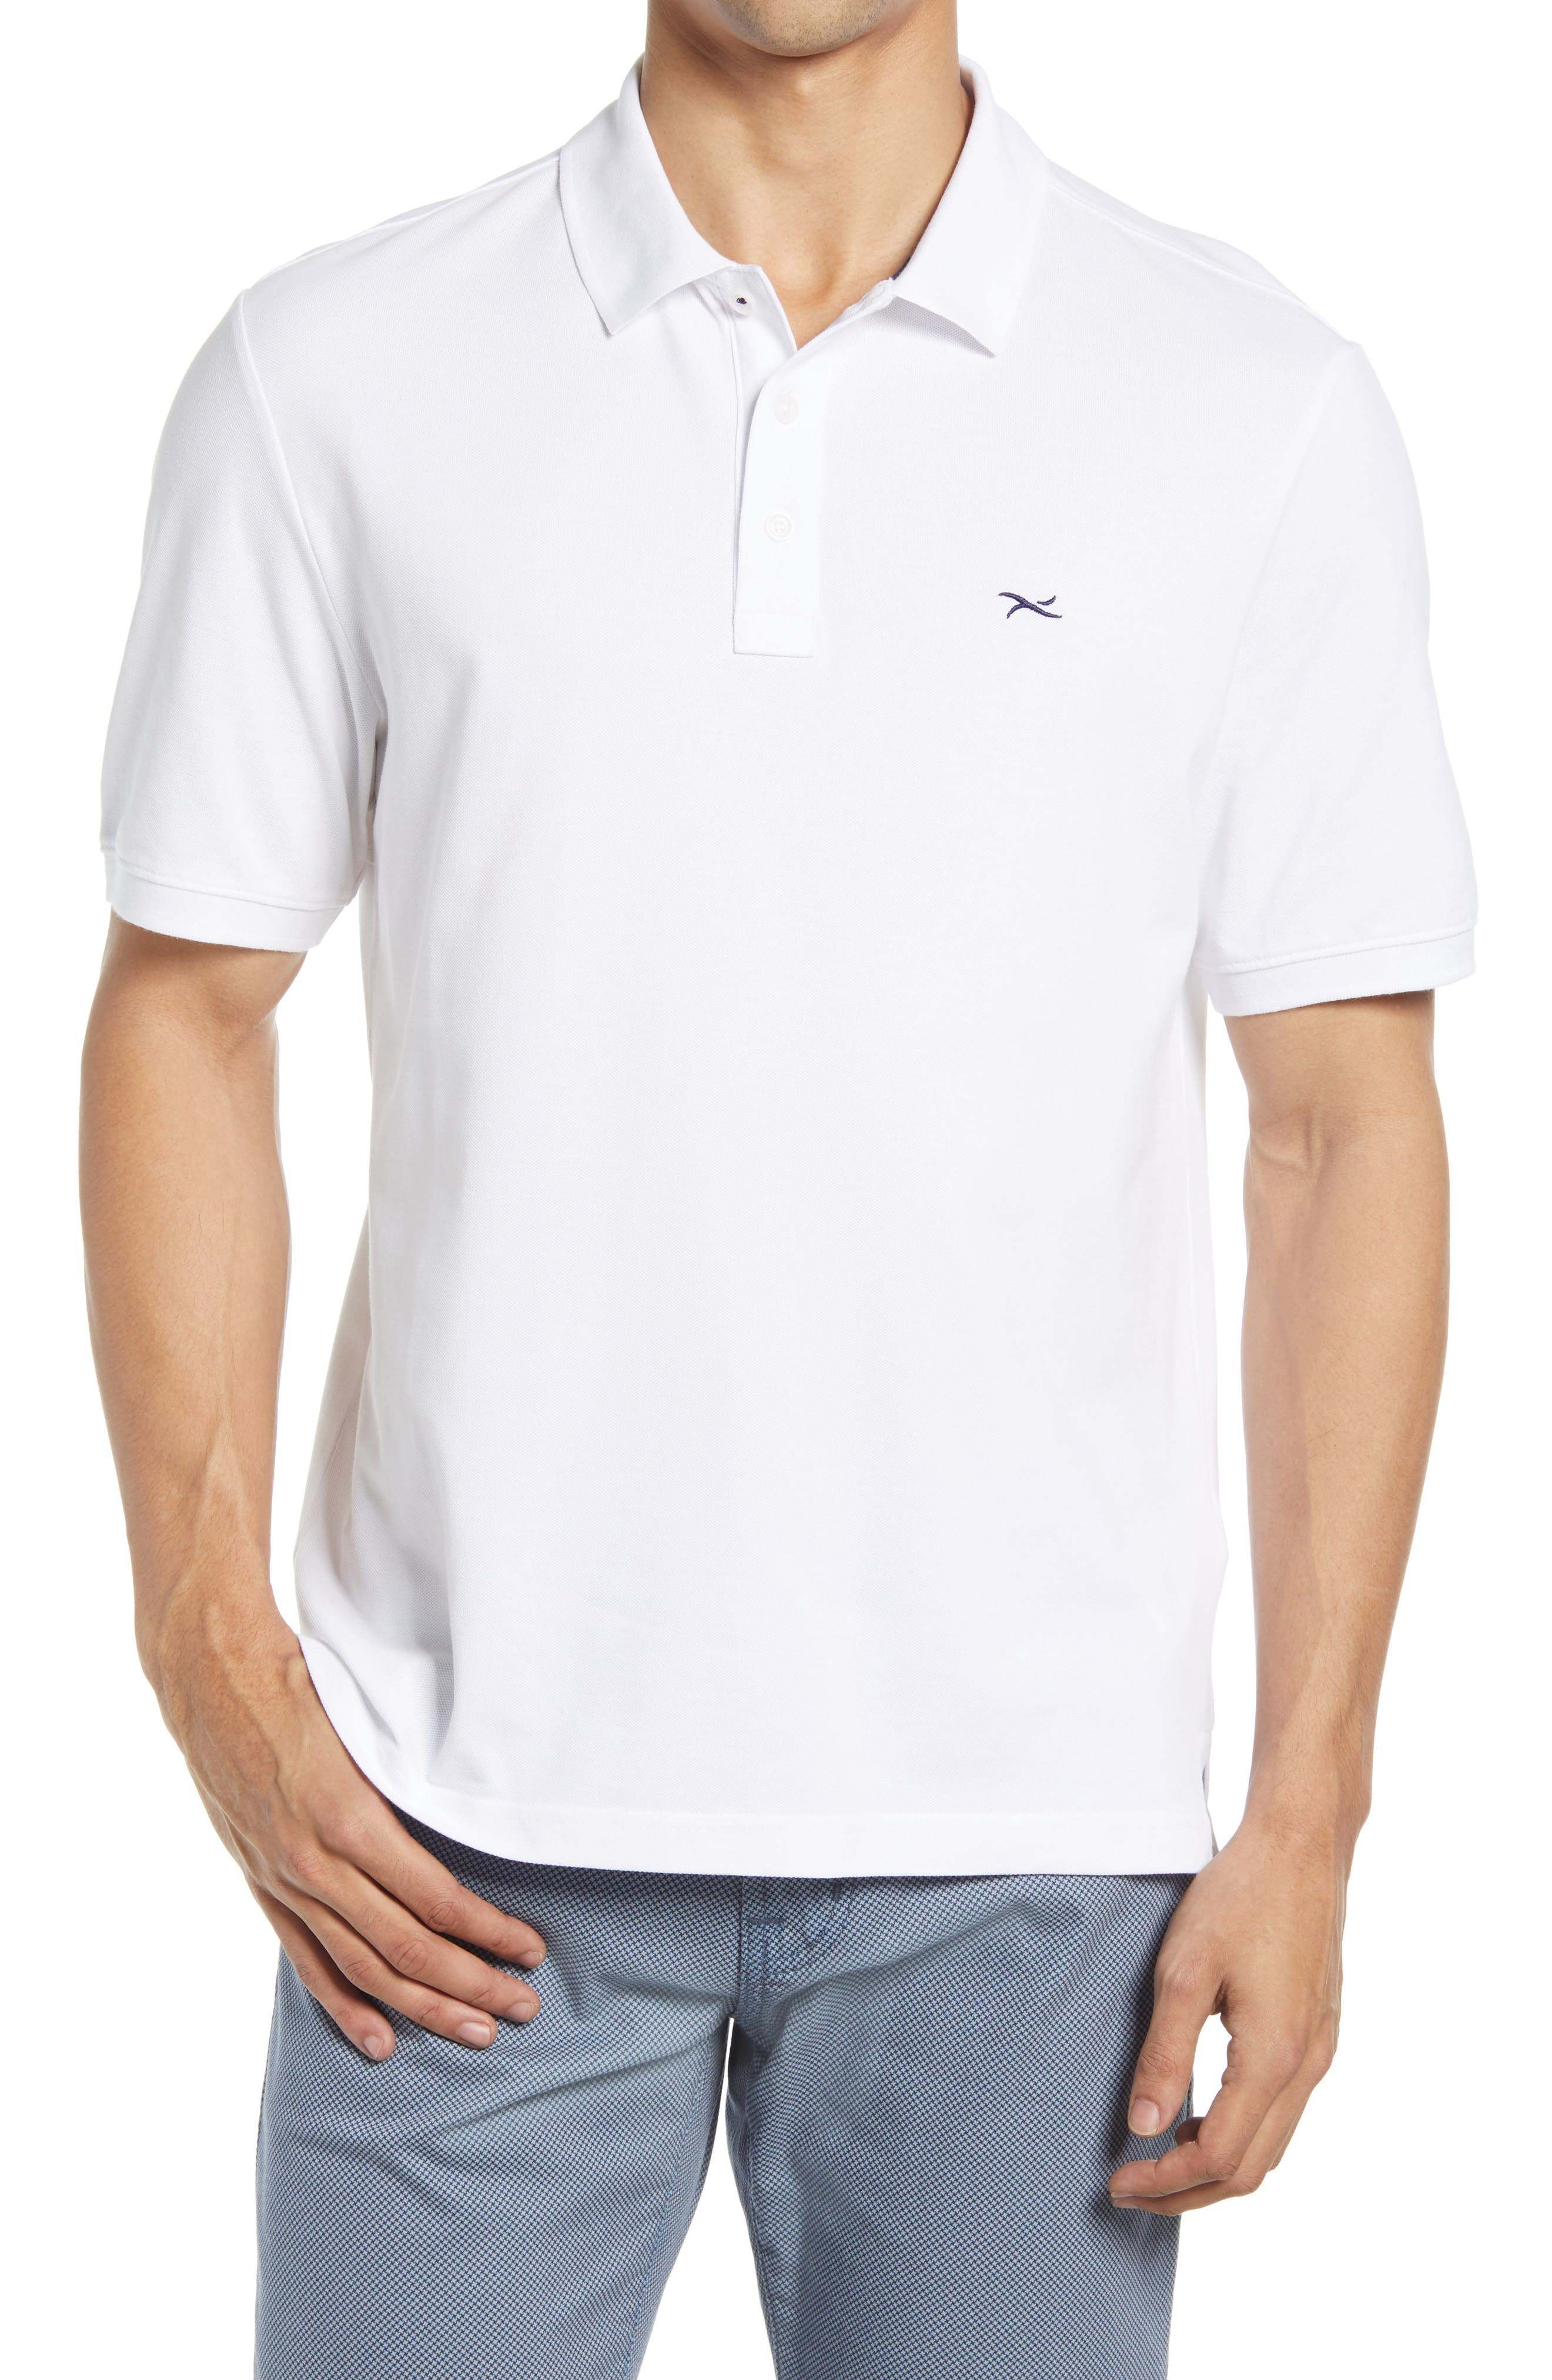 Pete Stretch Cotton Polo Shirt